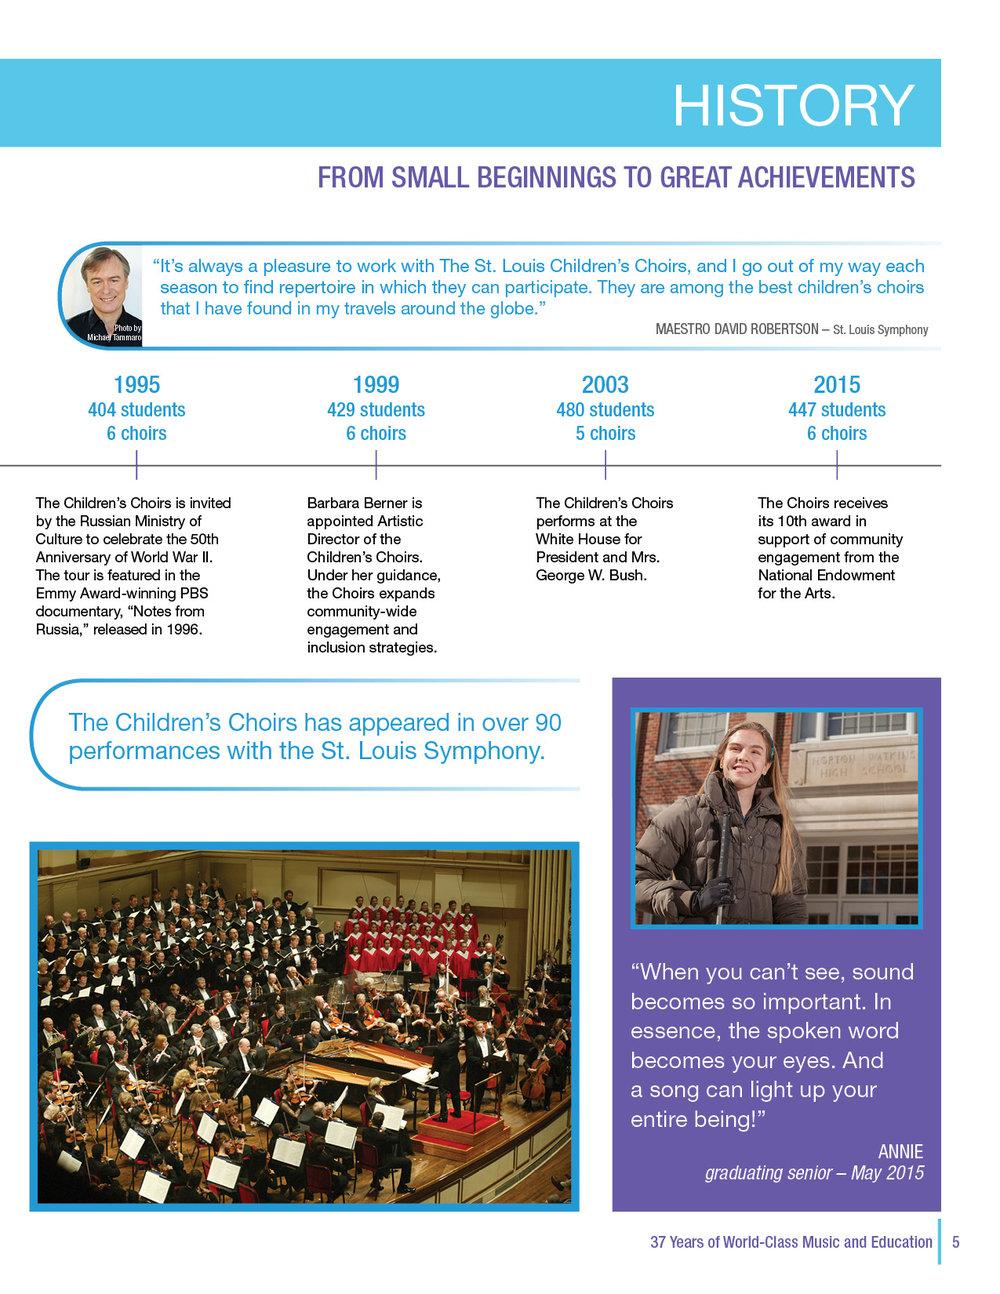 SLCC_Annual Report_2015_V12_hires5.jpg